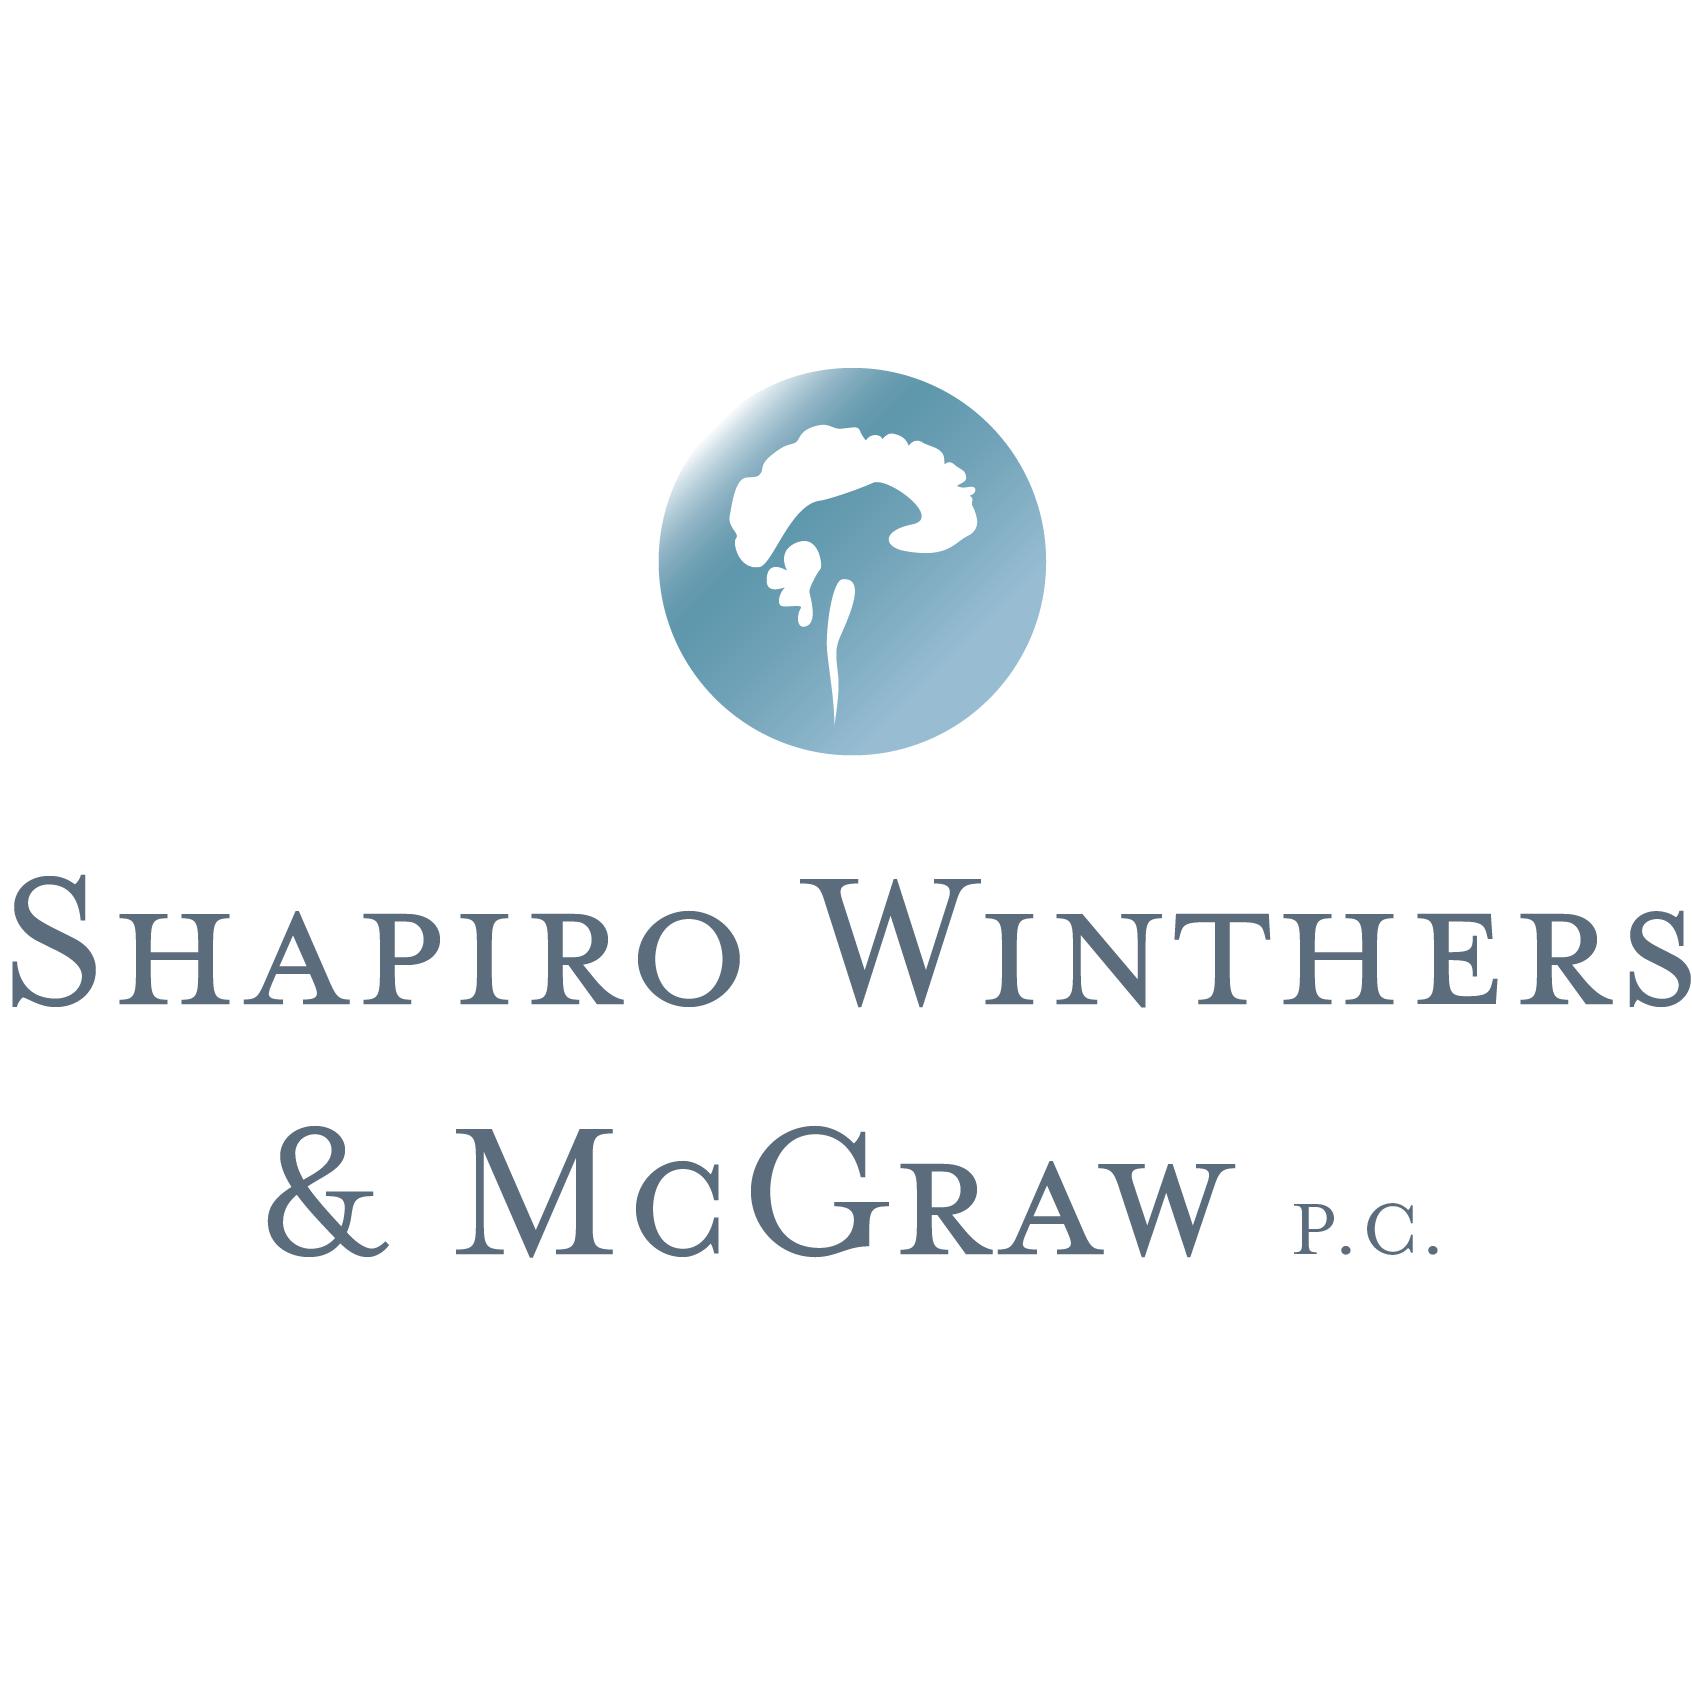 Shapiro Winthers & McGraw P.C.